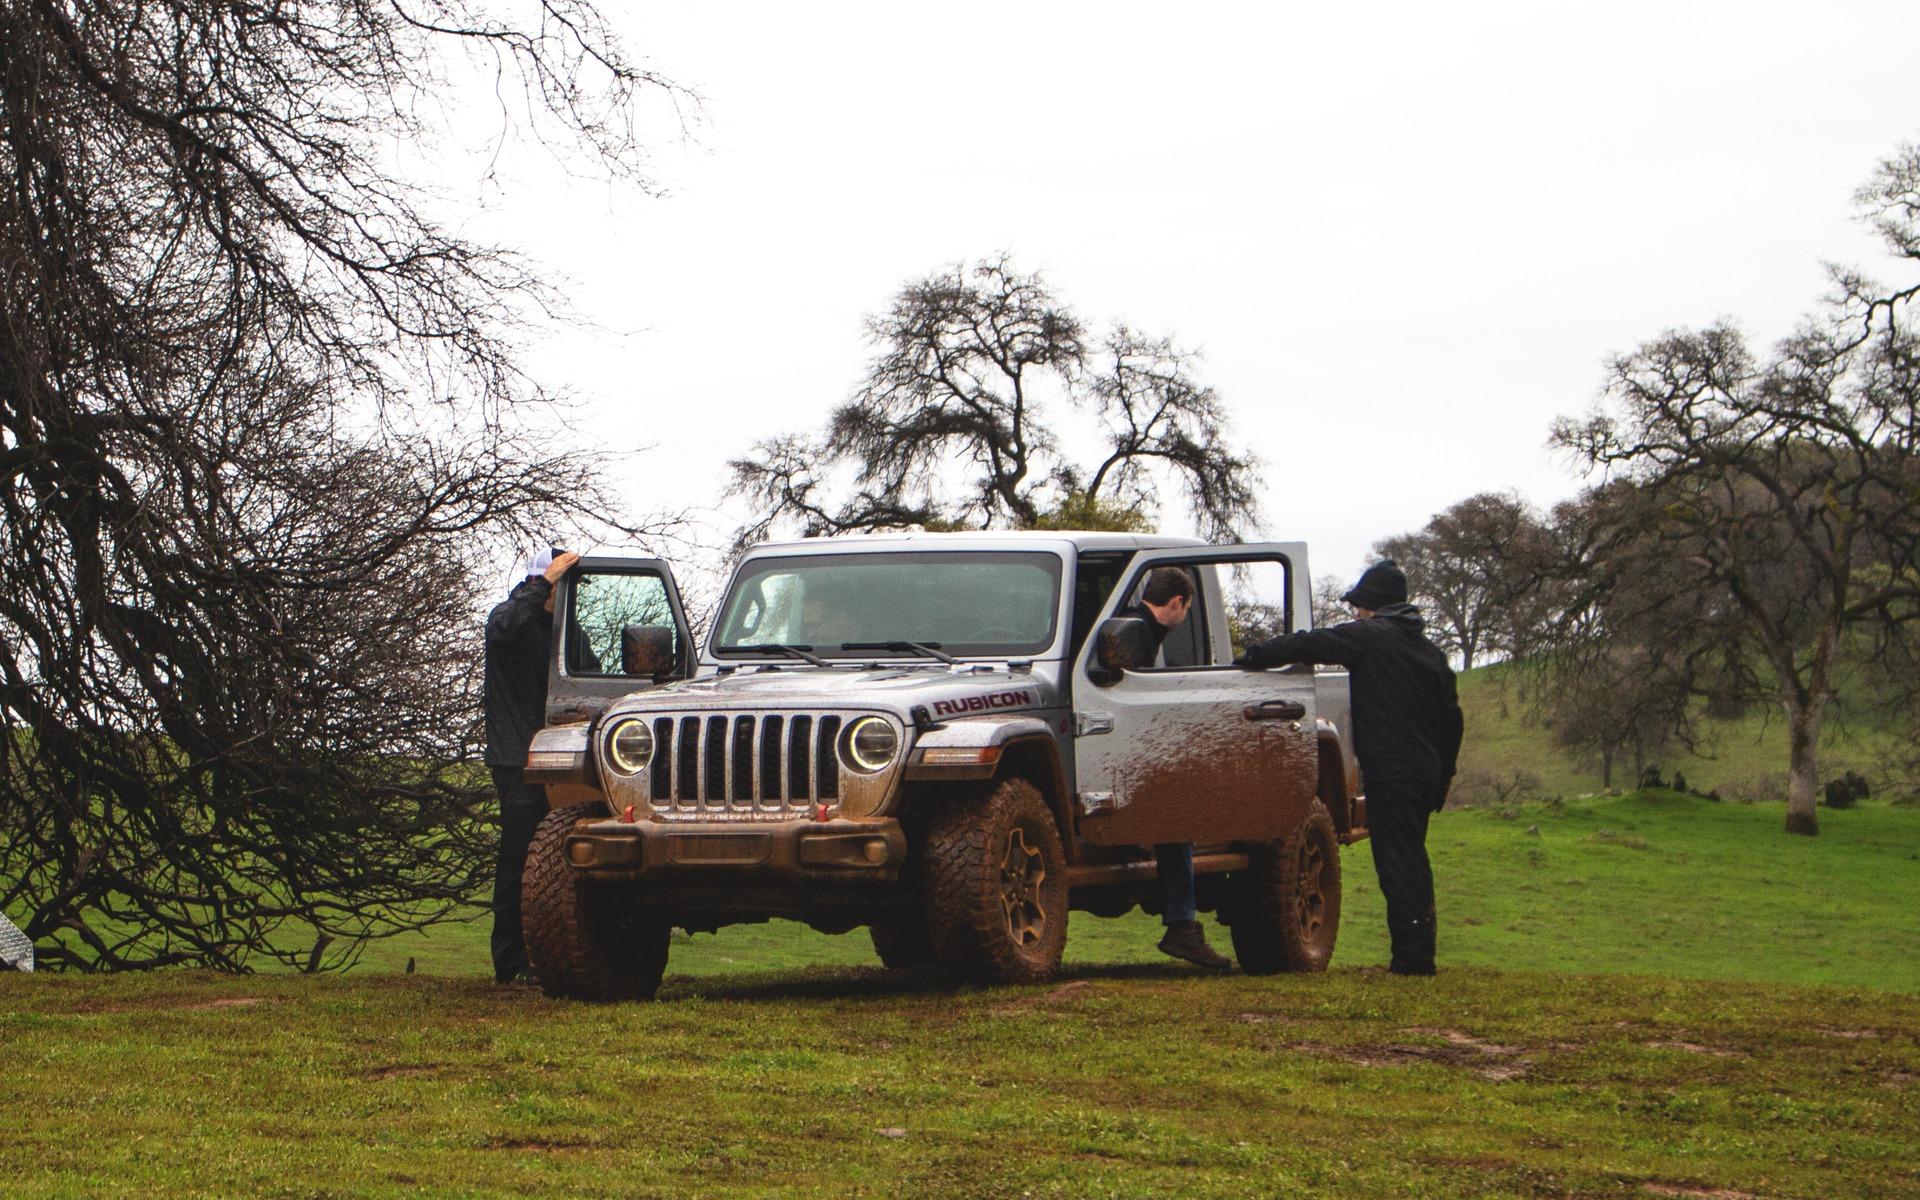 Fort Réussi Jouet Jeep 2020Un Guide Auto Gladiator Gros rthdCsQ